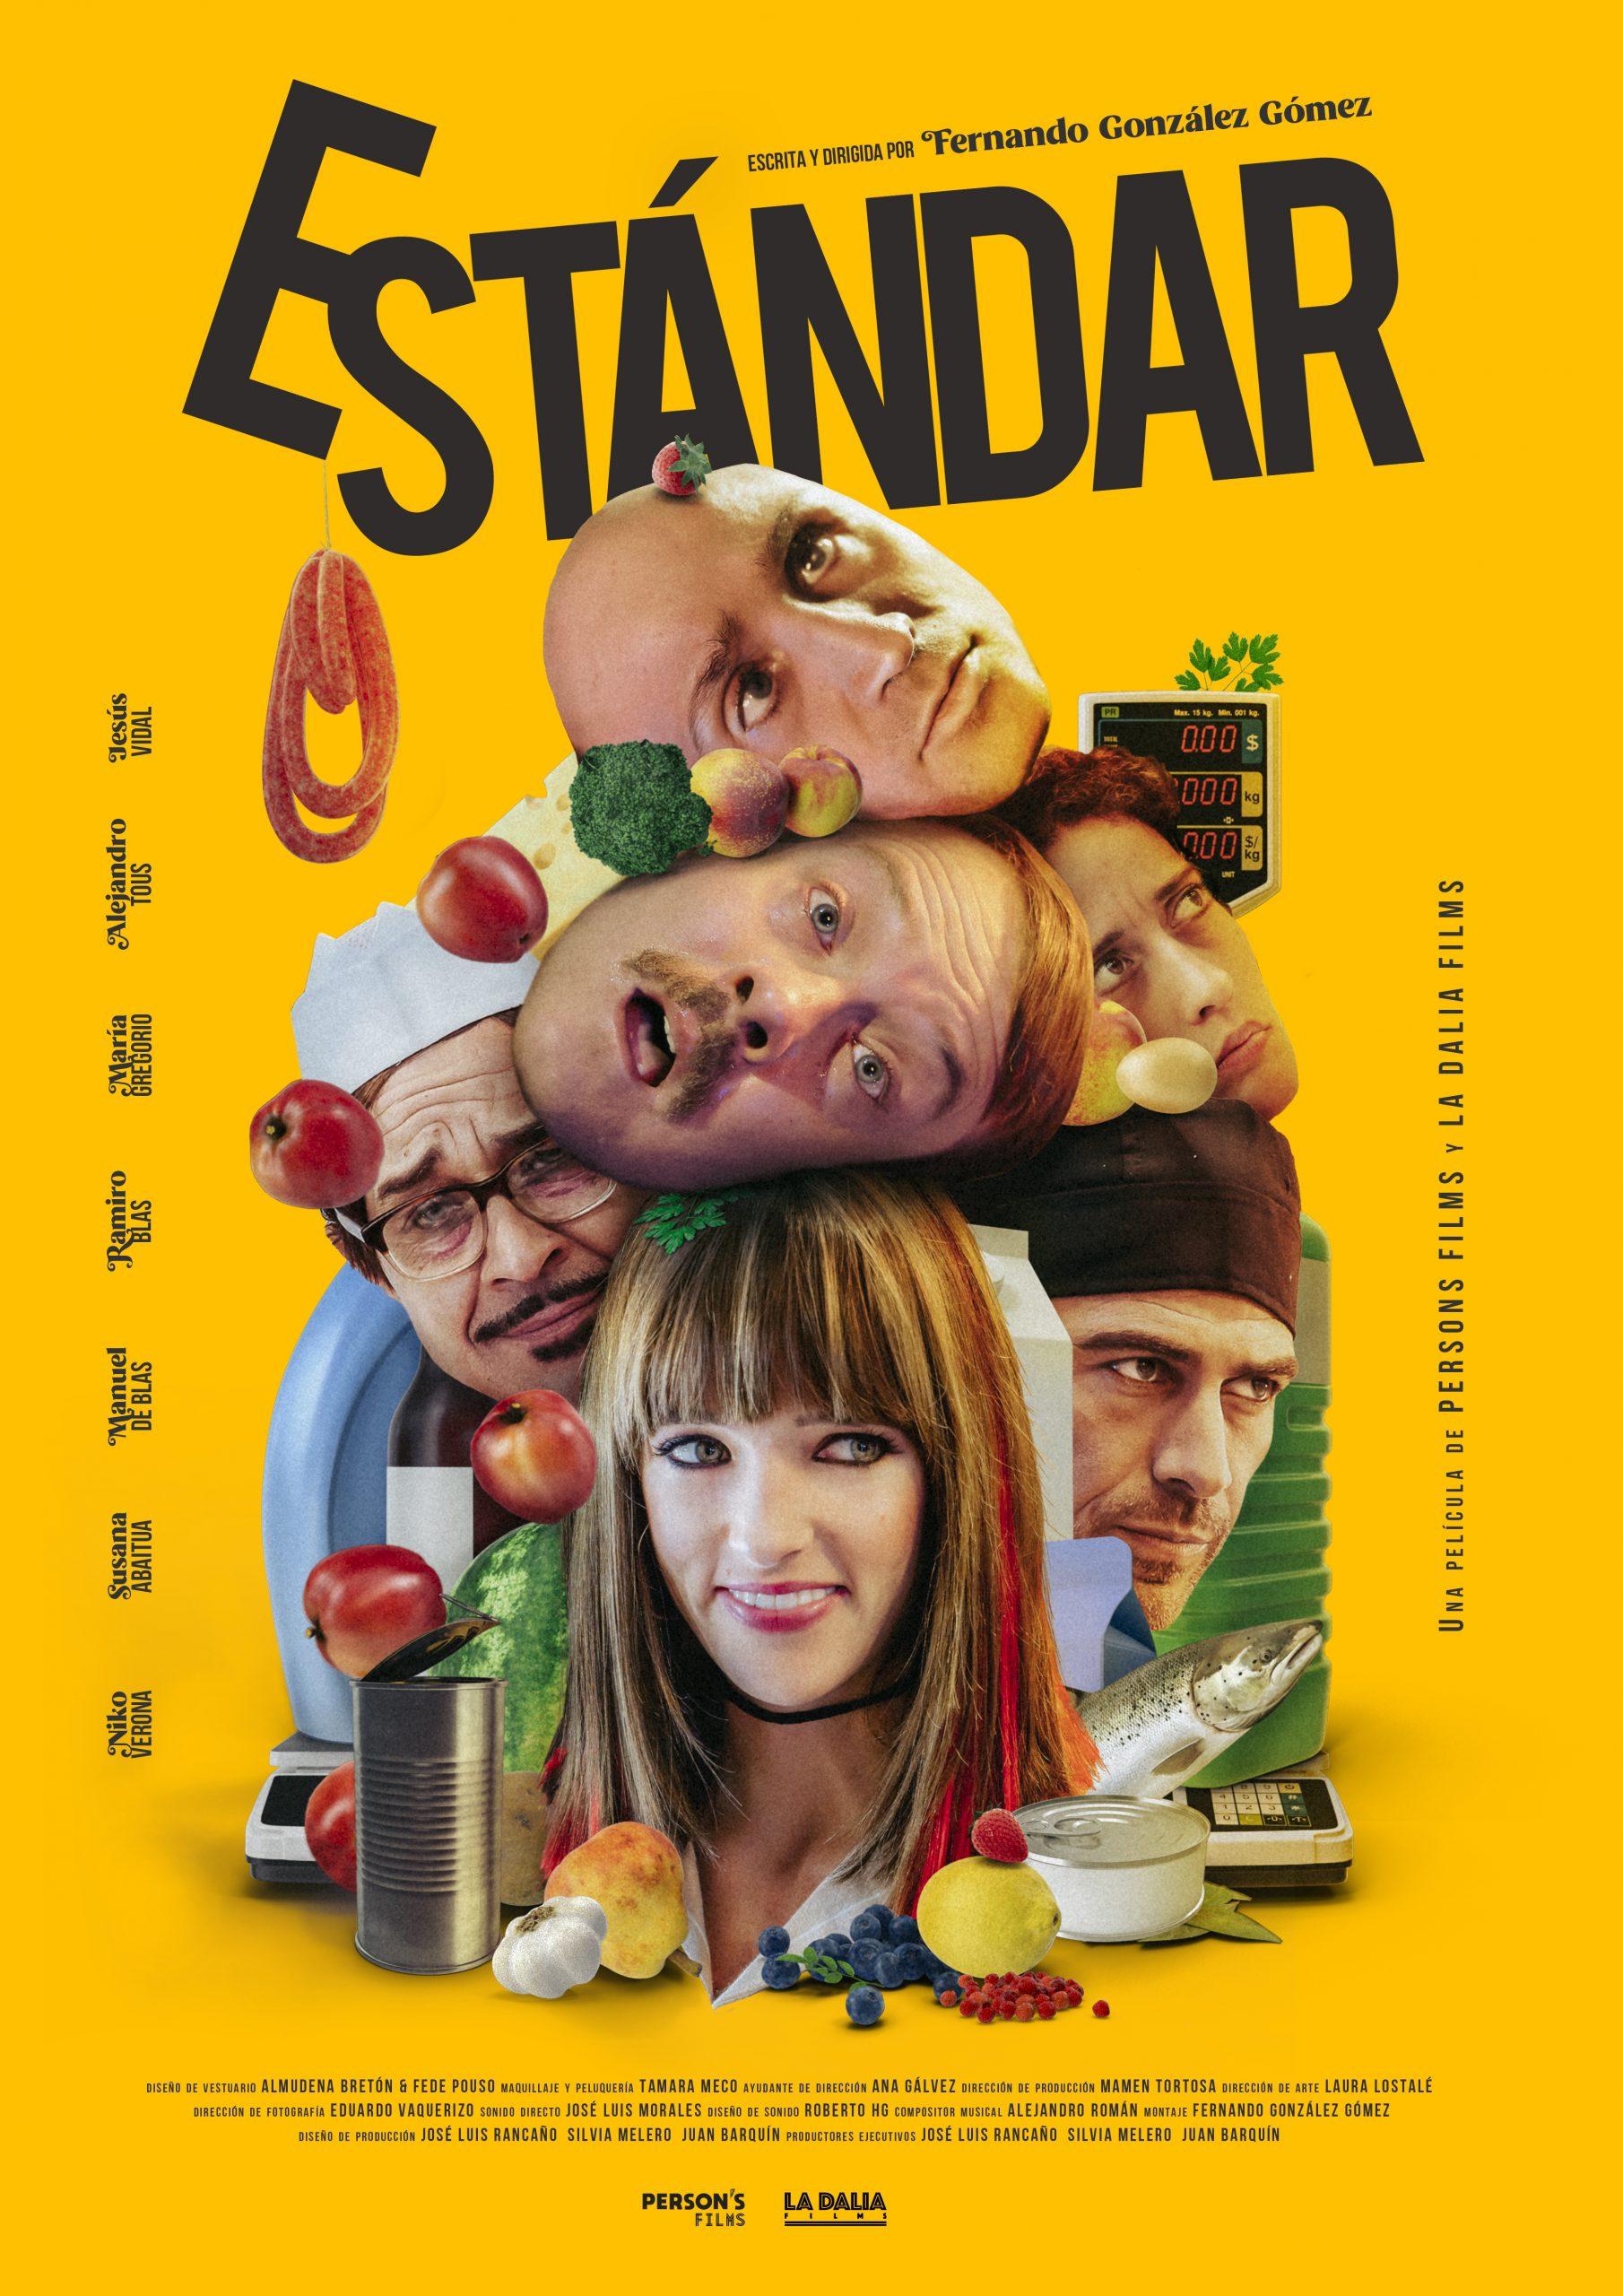 Estándar (Standard)